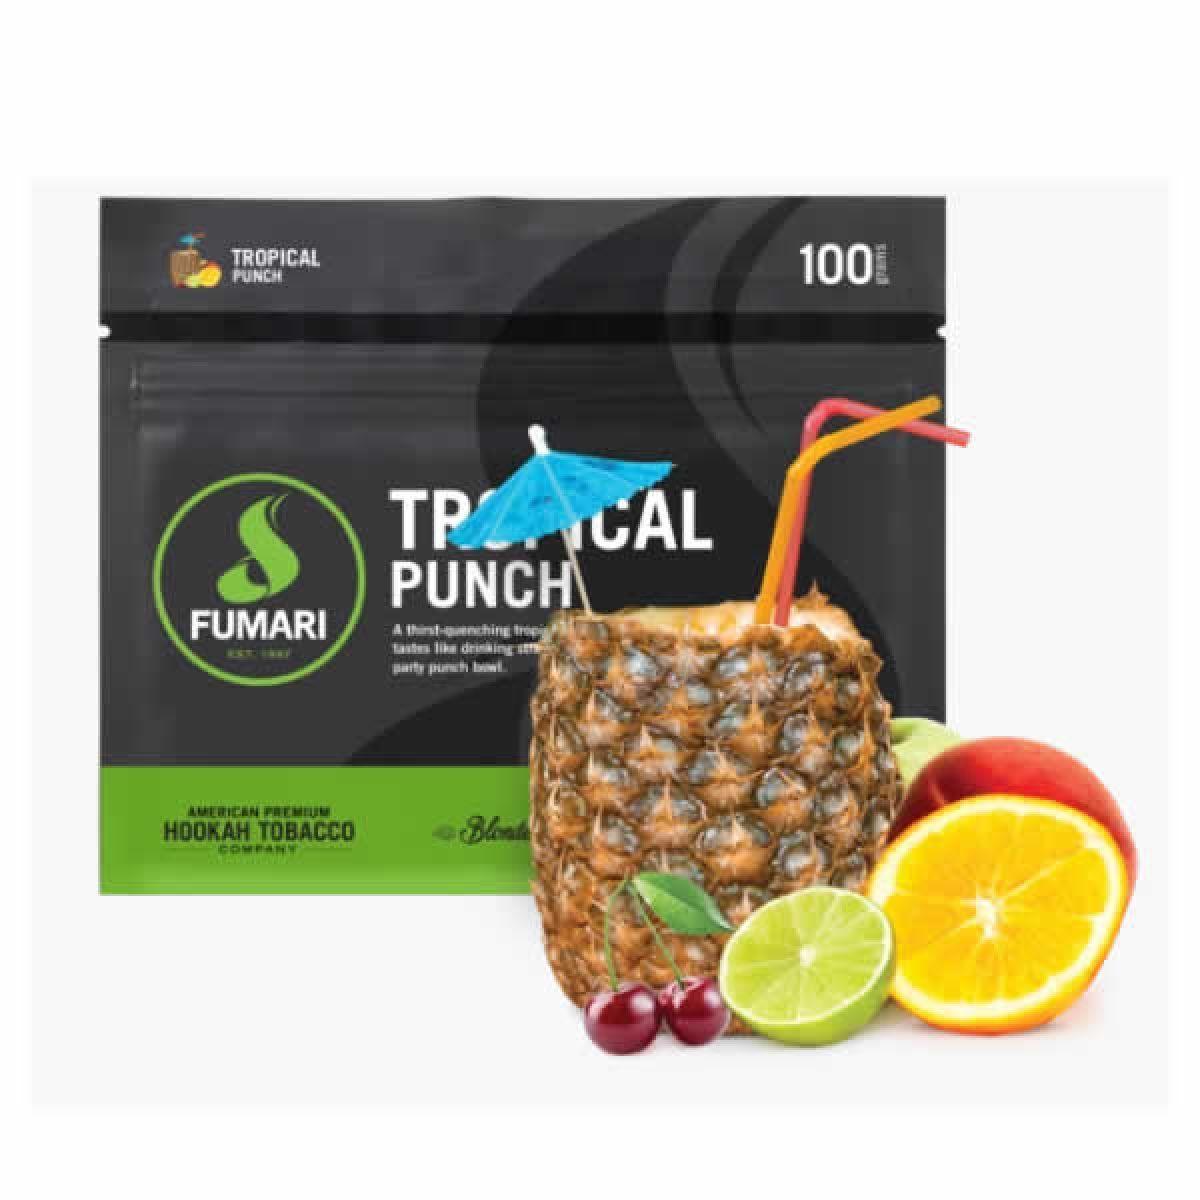 FUMARI TROPICAL PUNCH 100G/UND